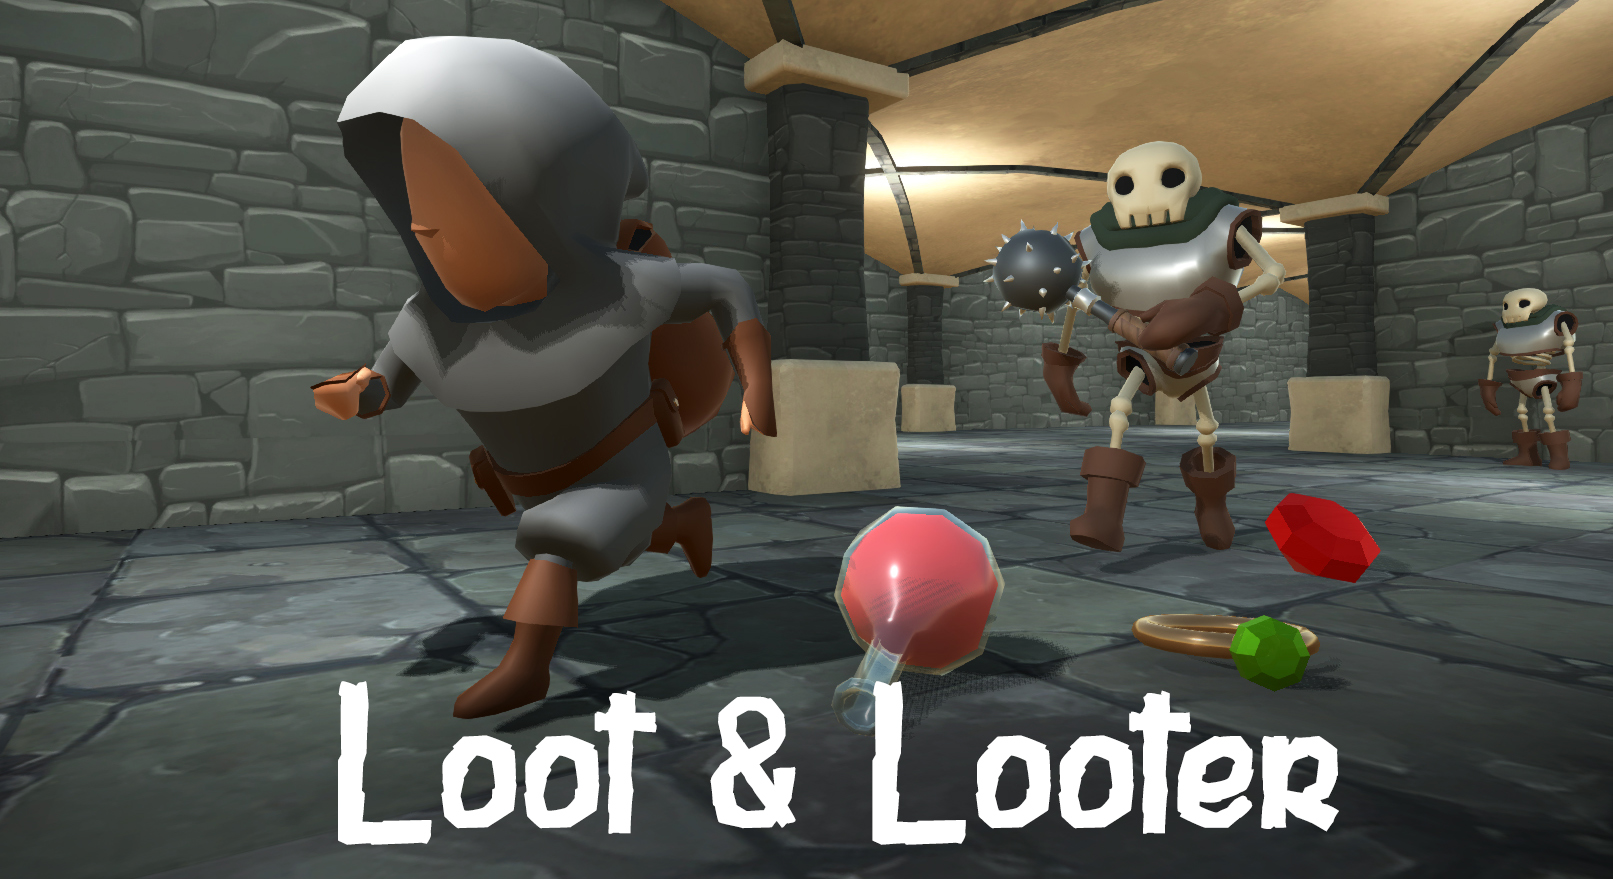 Loot & Looter